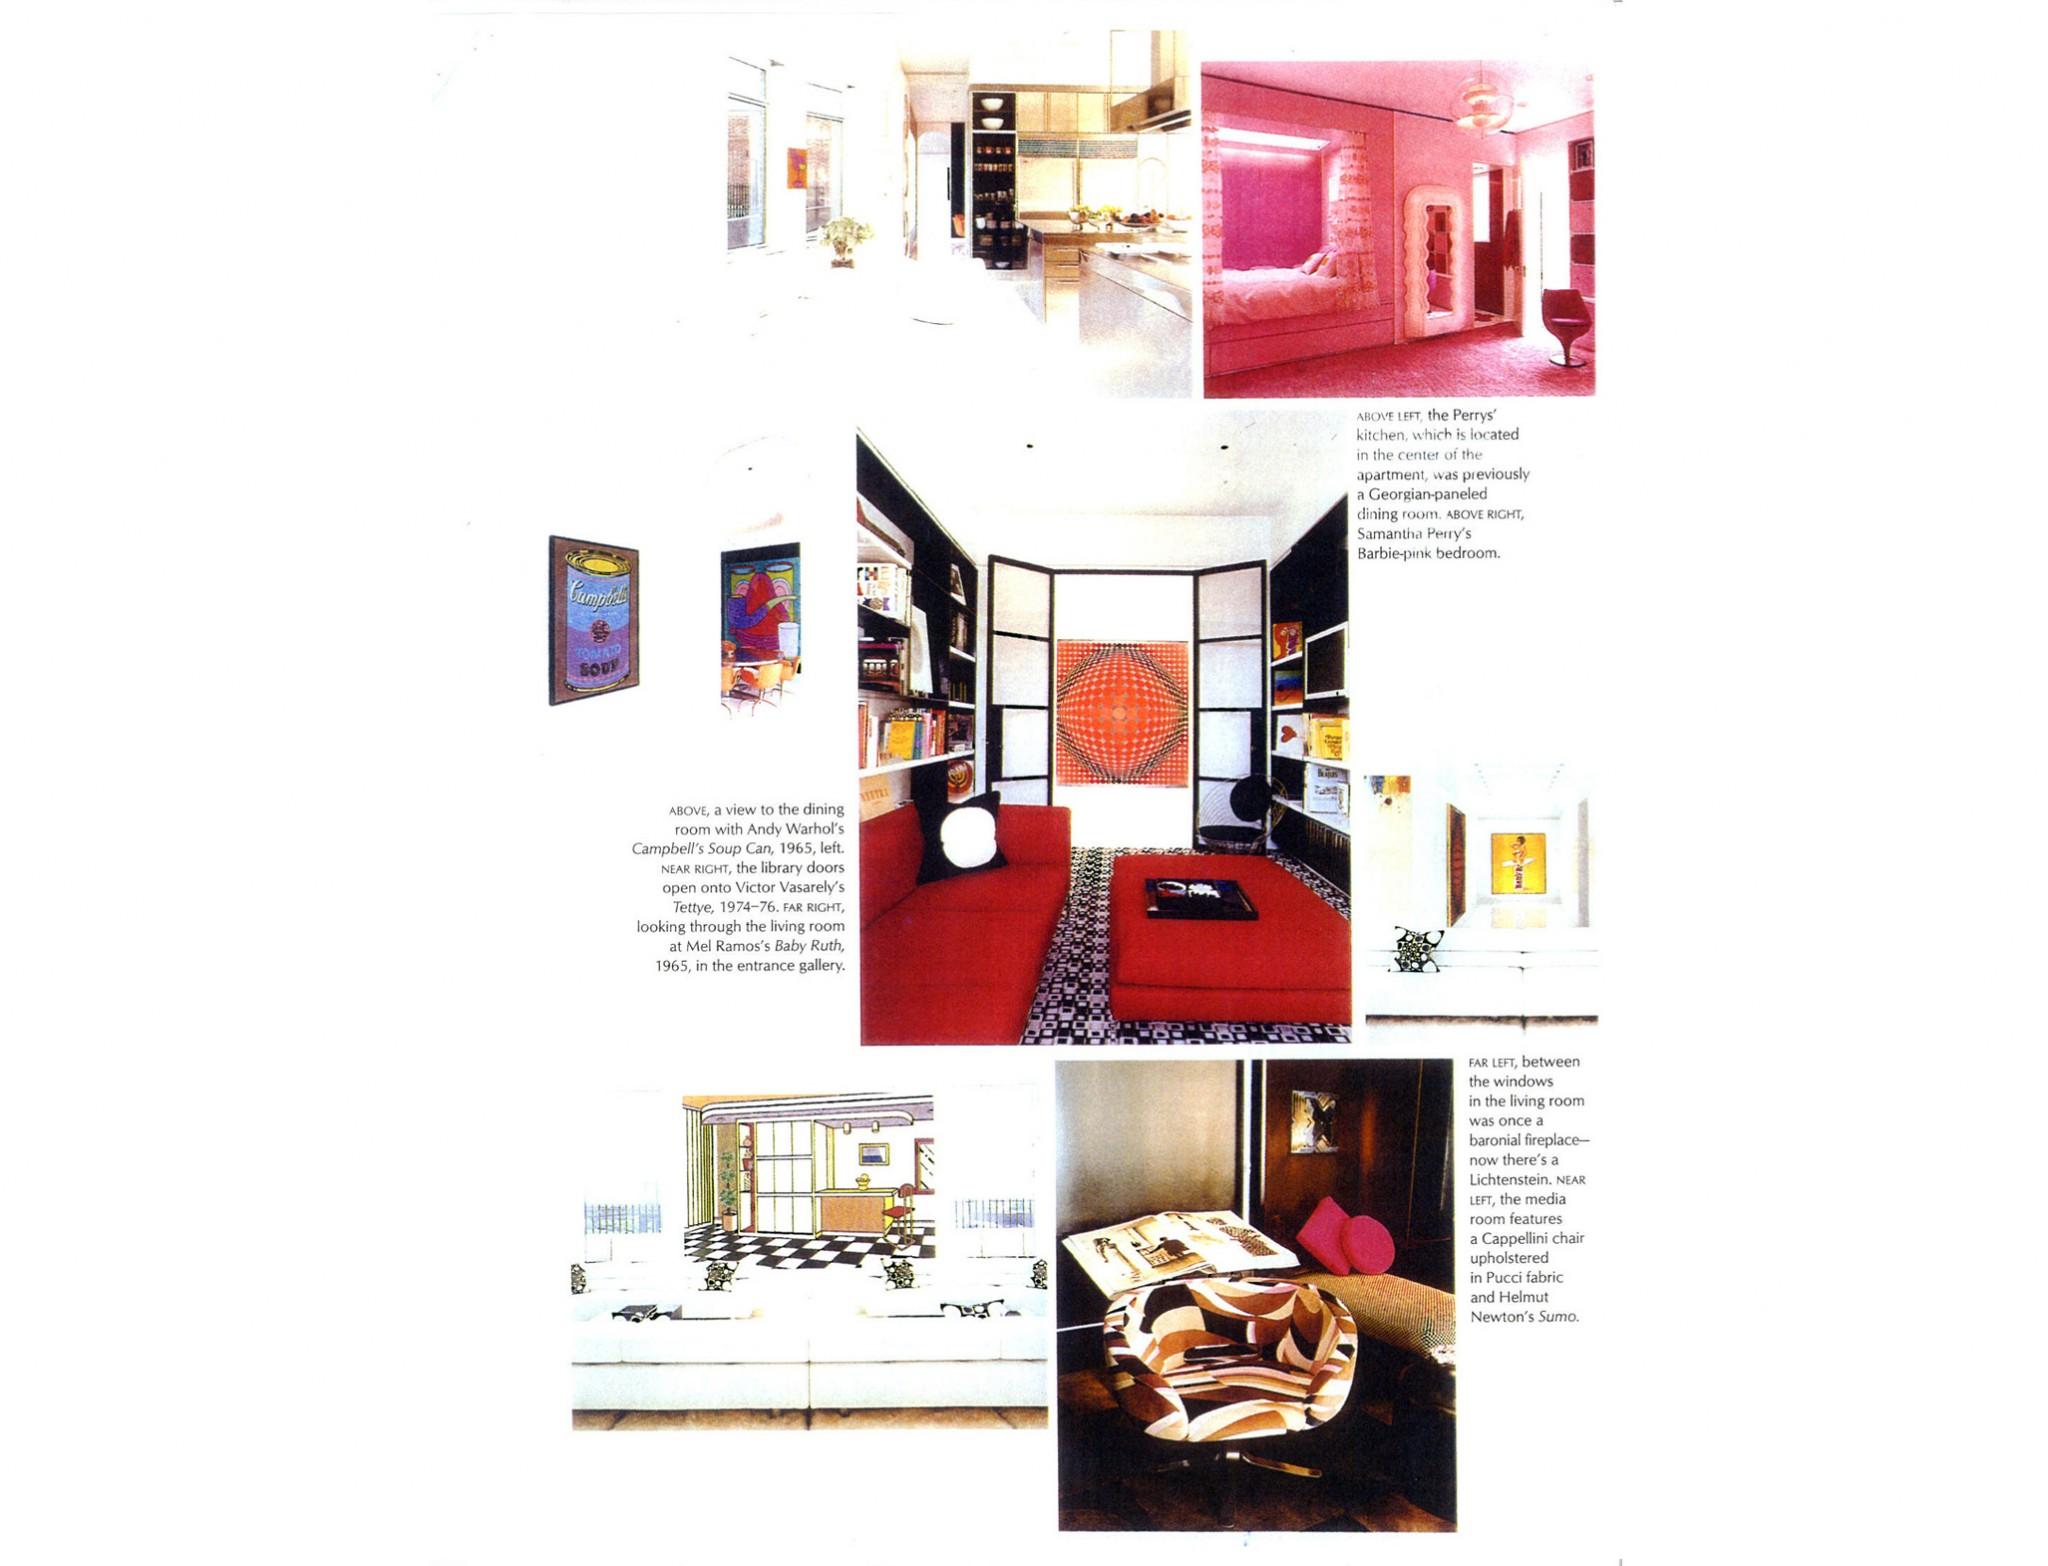 Vogue_Page_4